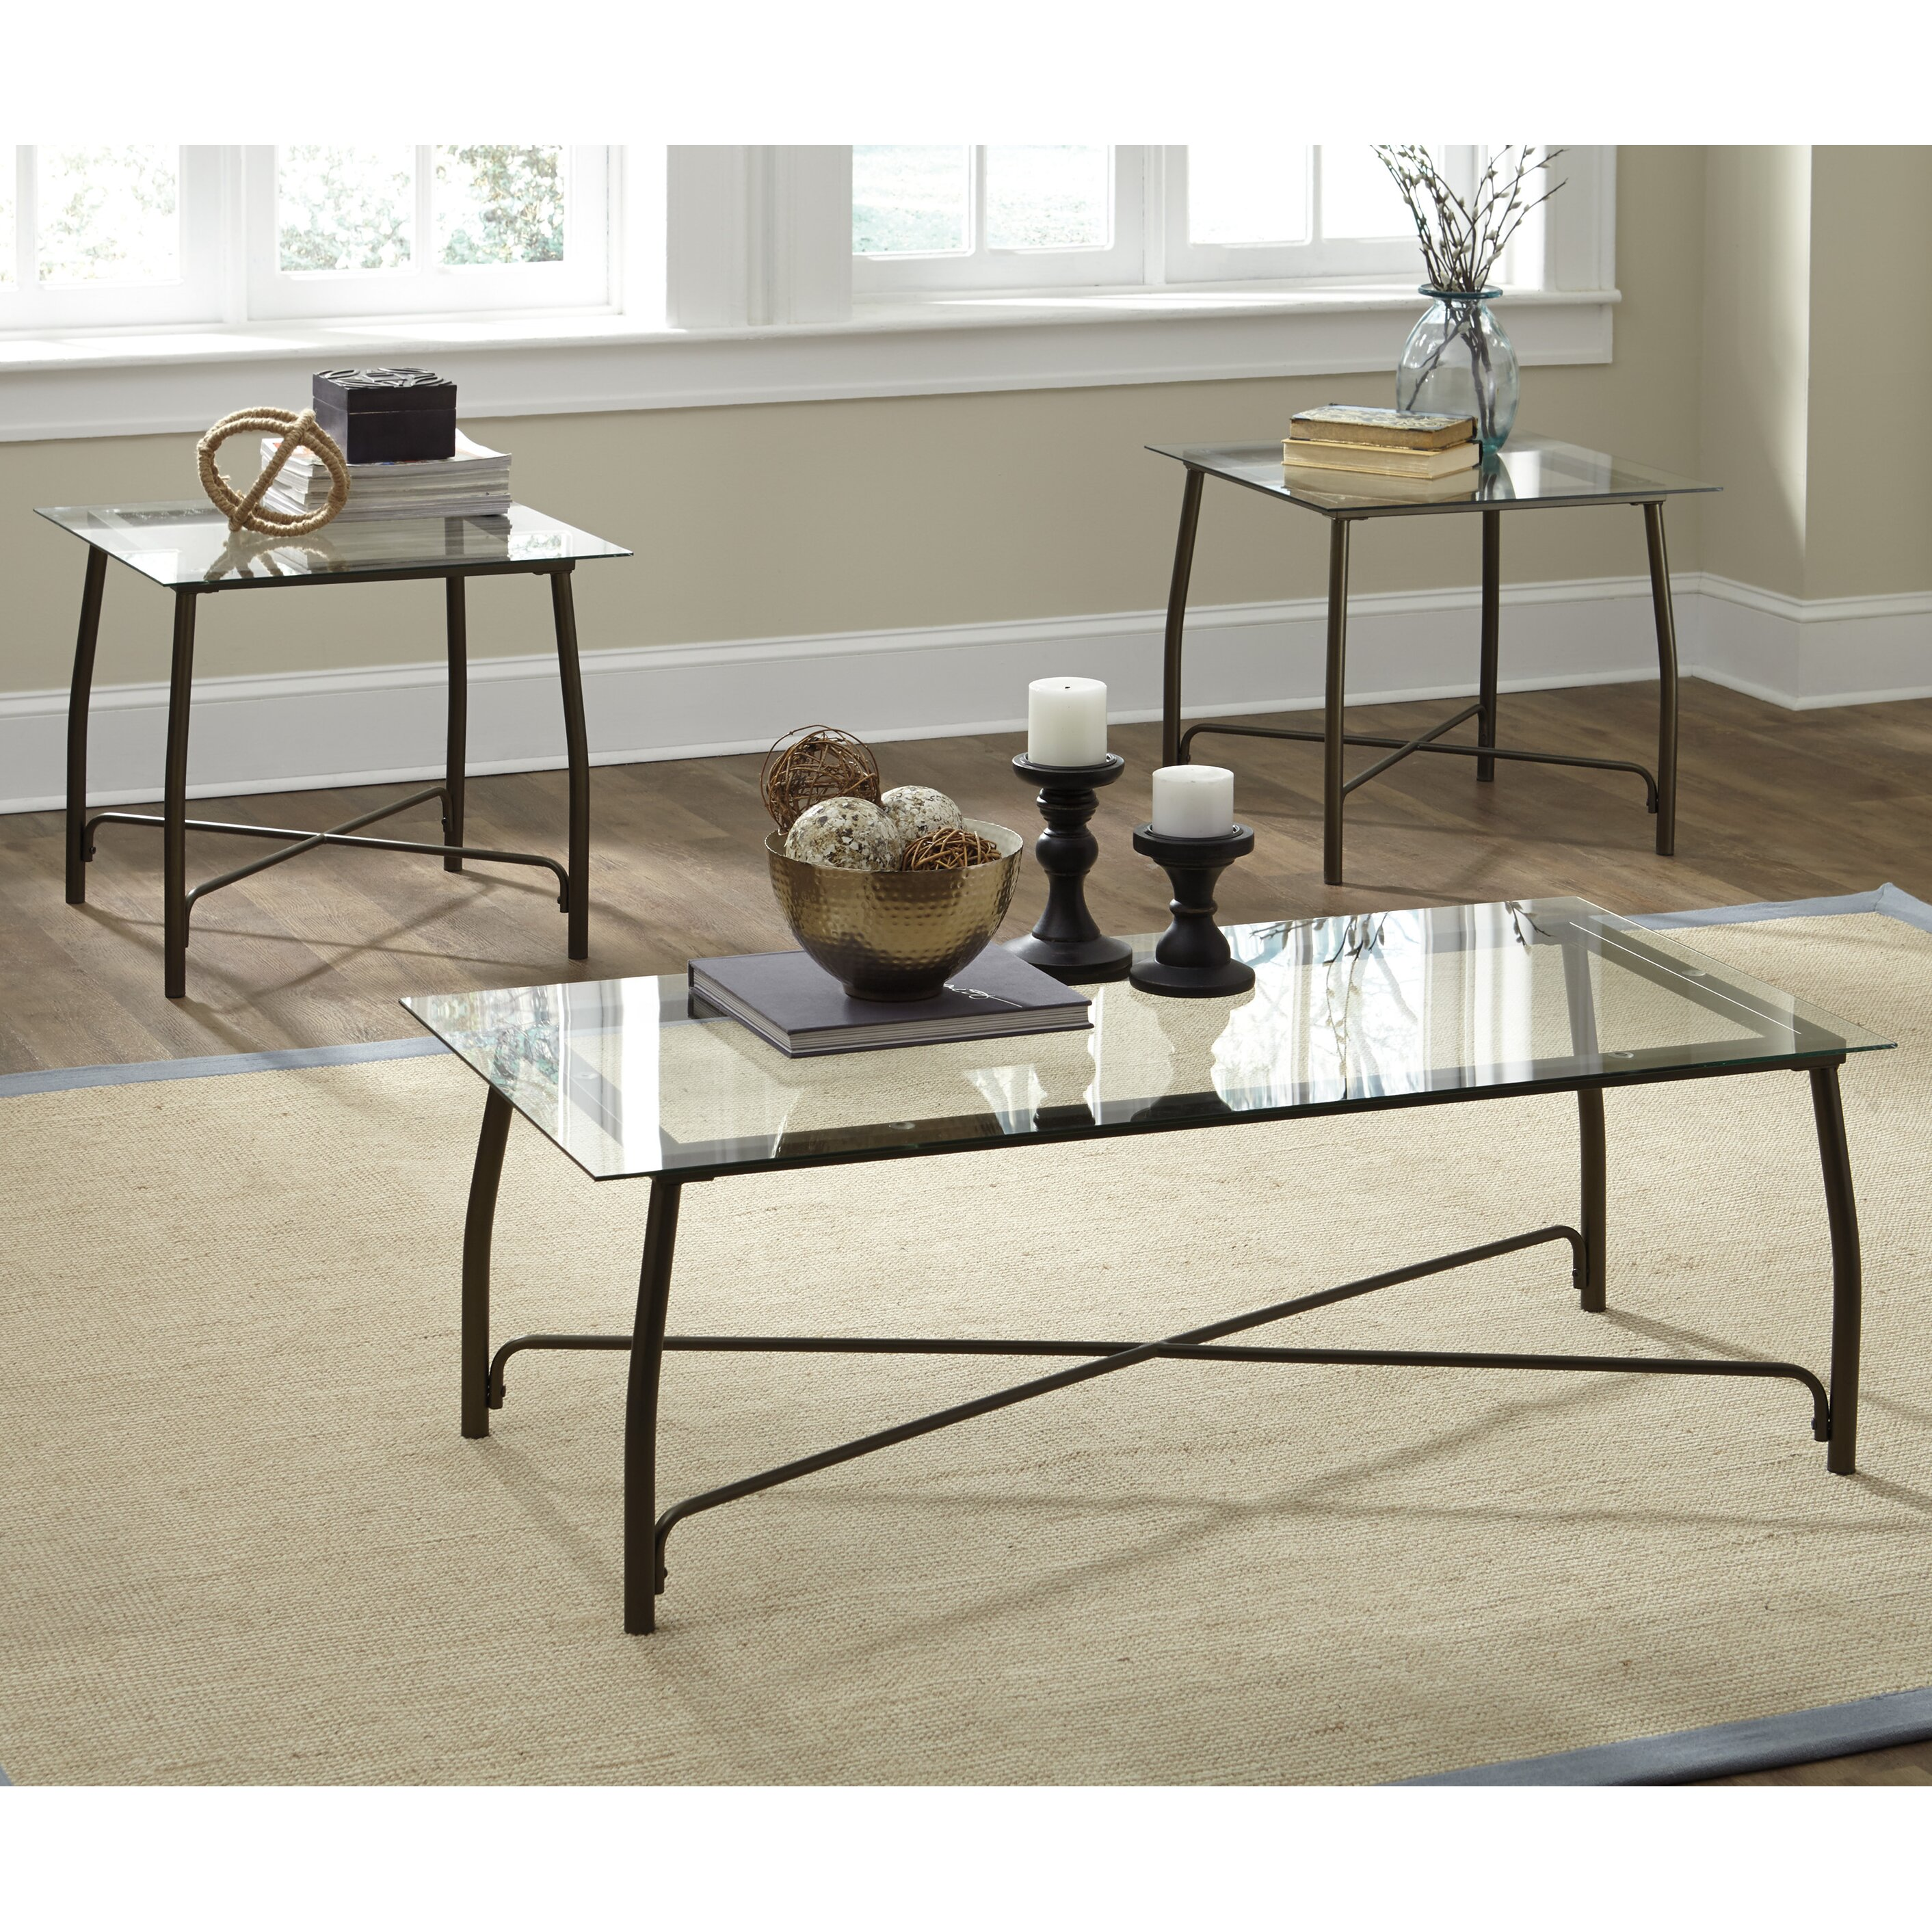 Zipcode design ismael 3 piece coffee table set wayfair for Three piece living room table set